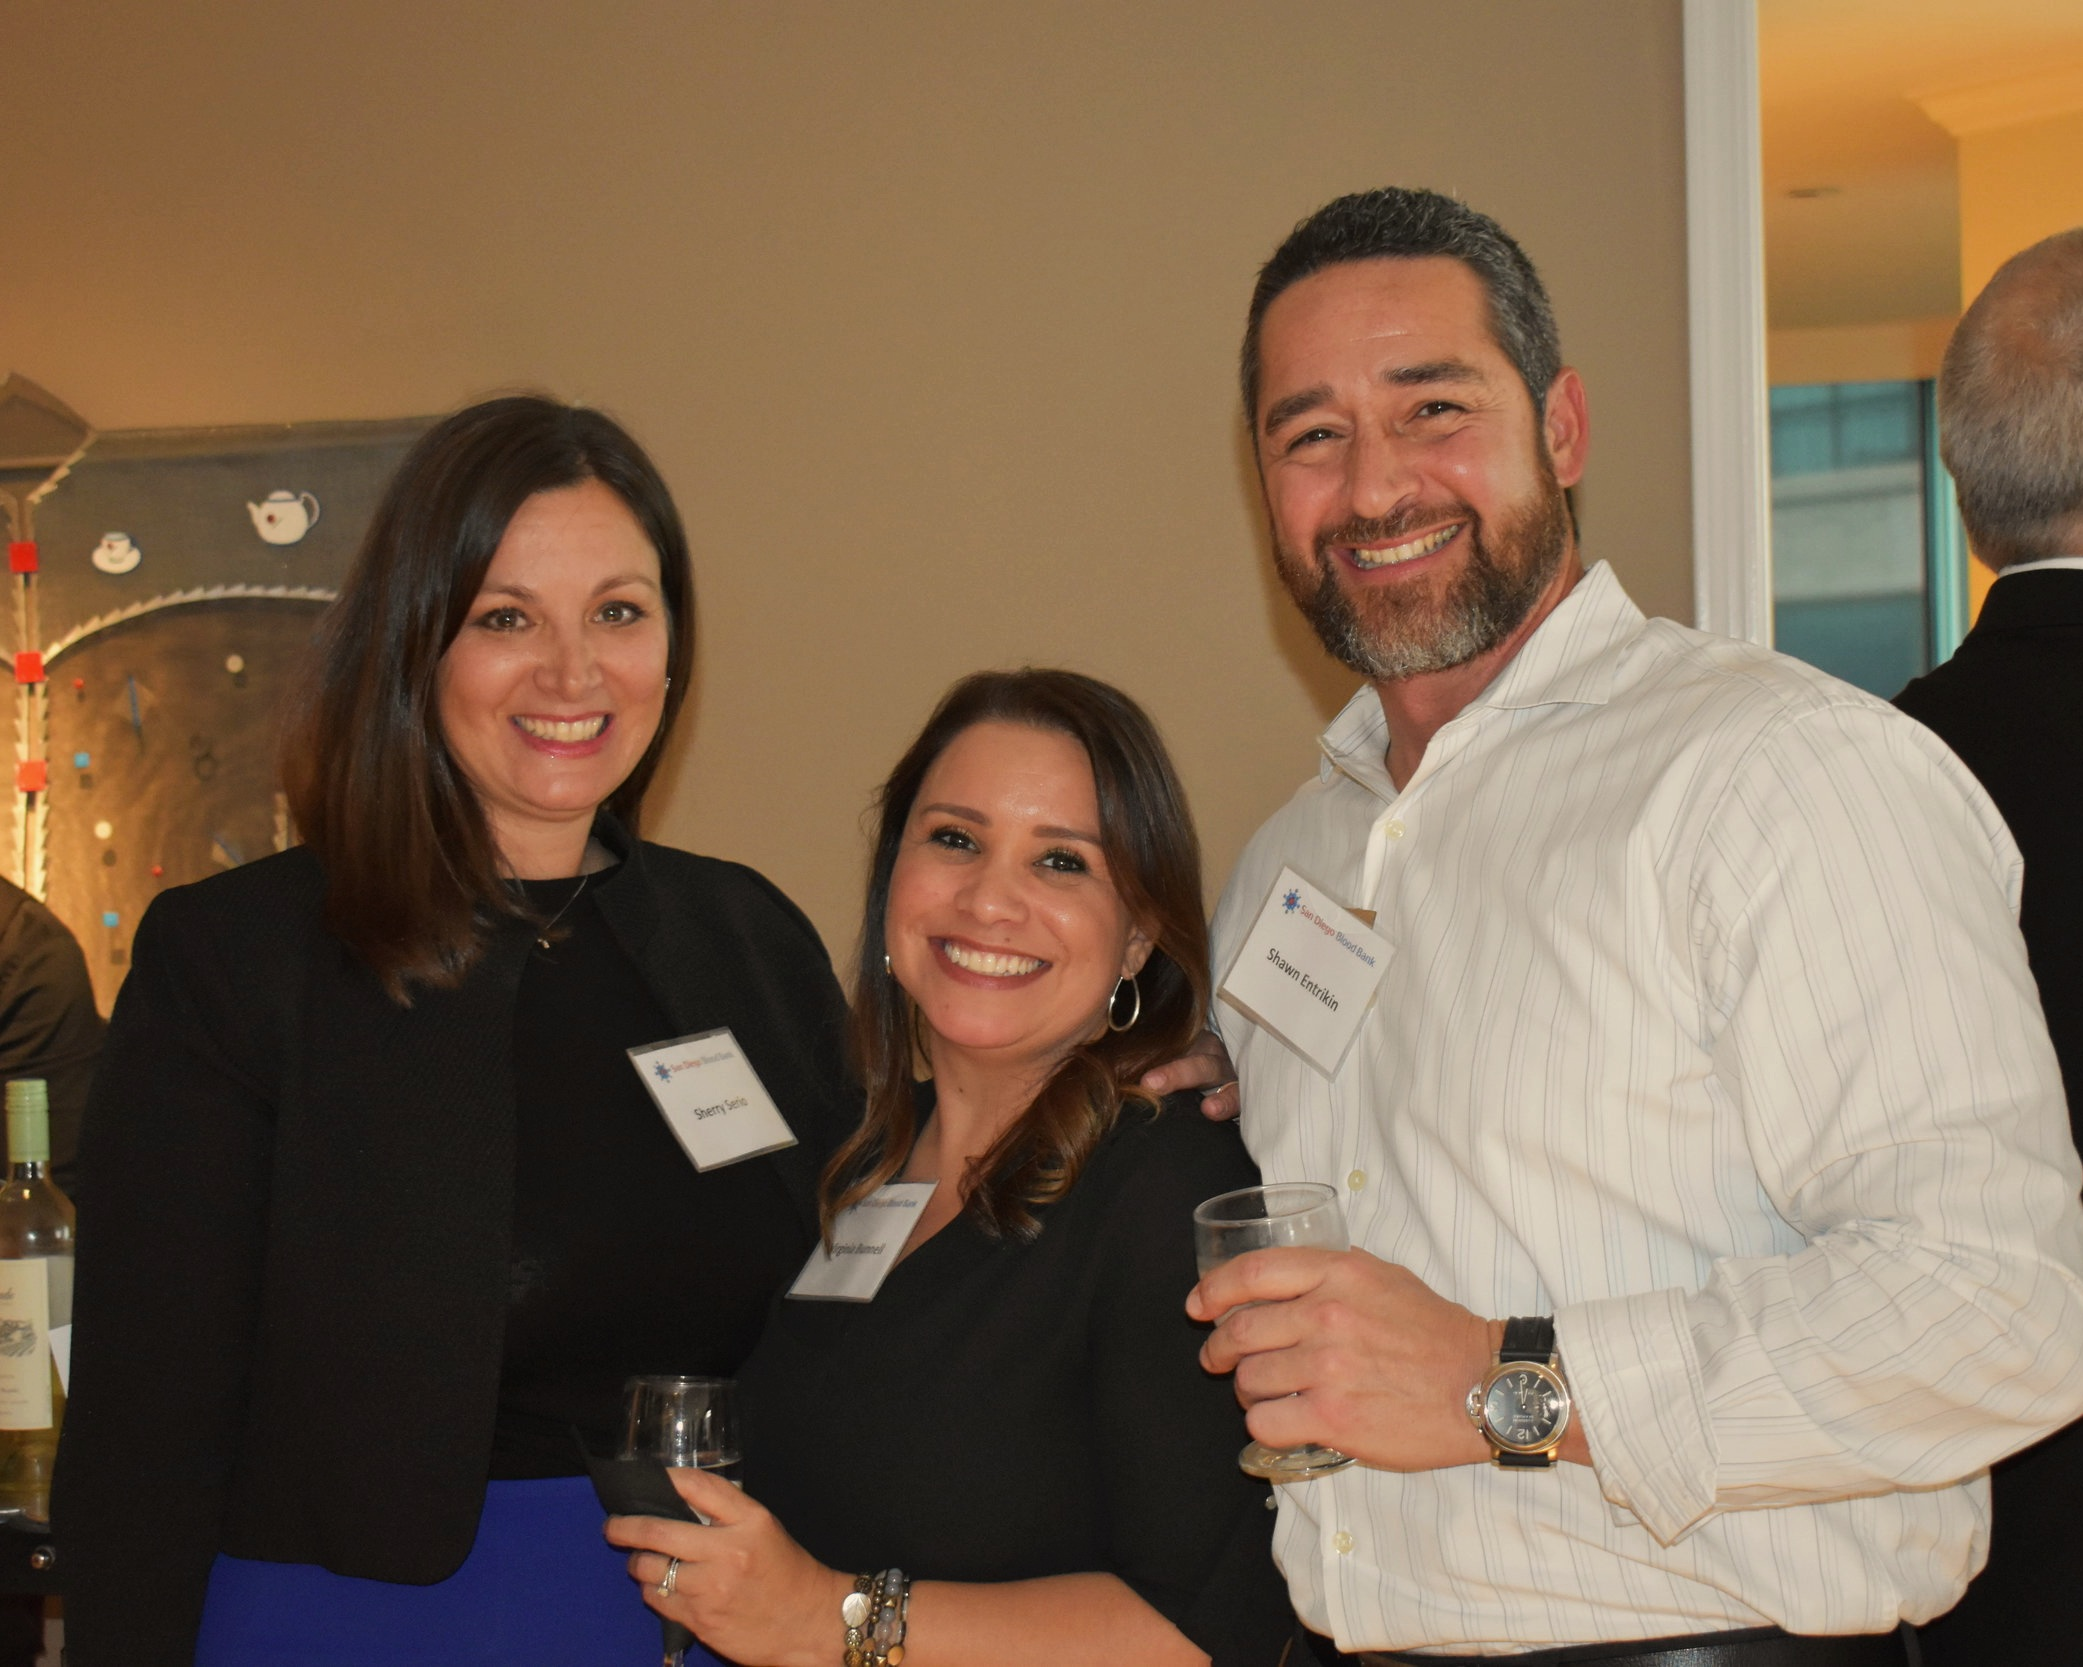 Sherry Serio, Virginia, and Shawn Entrikin